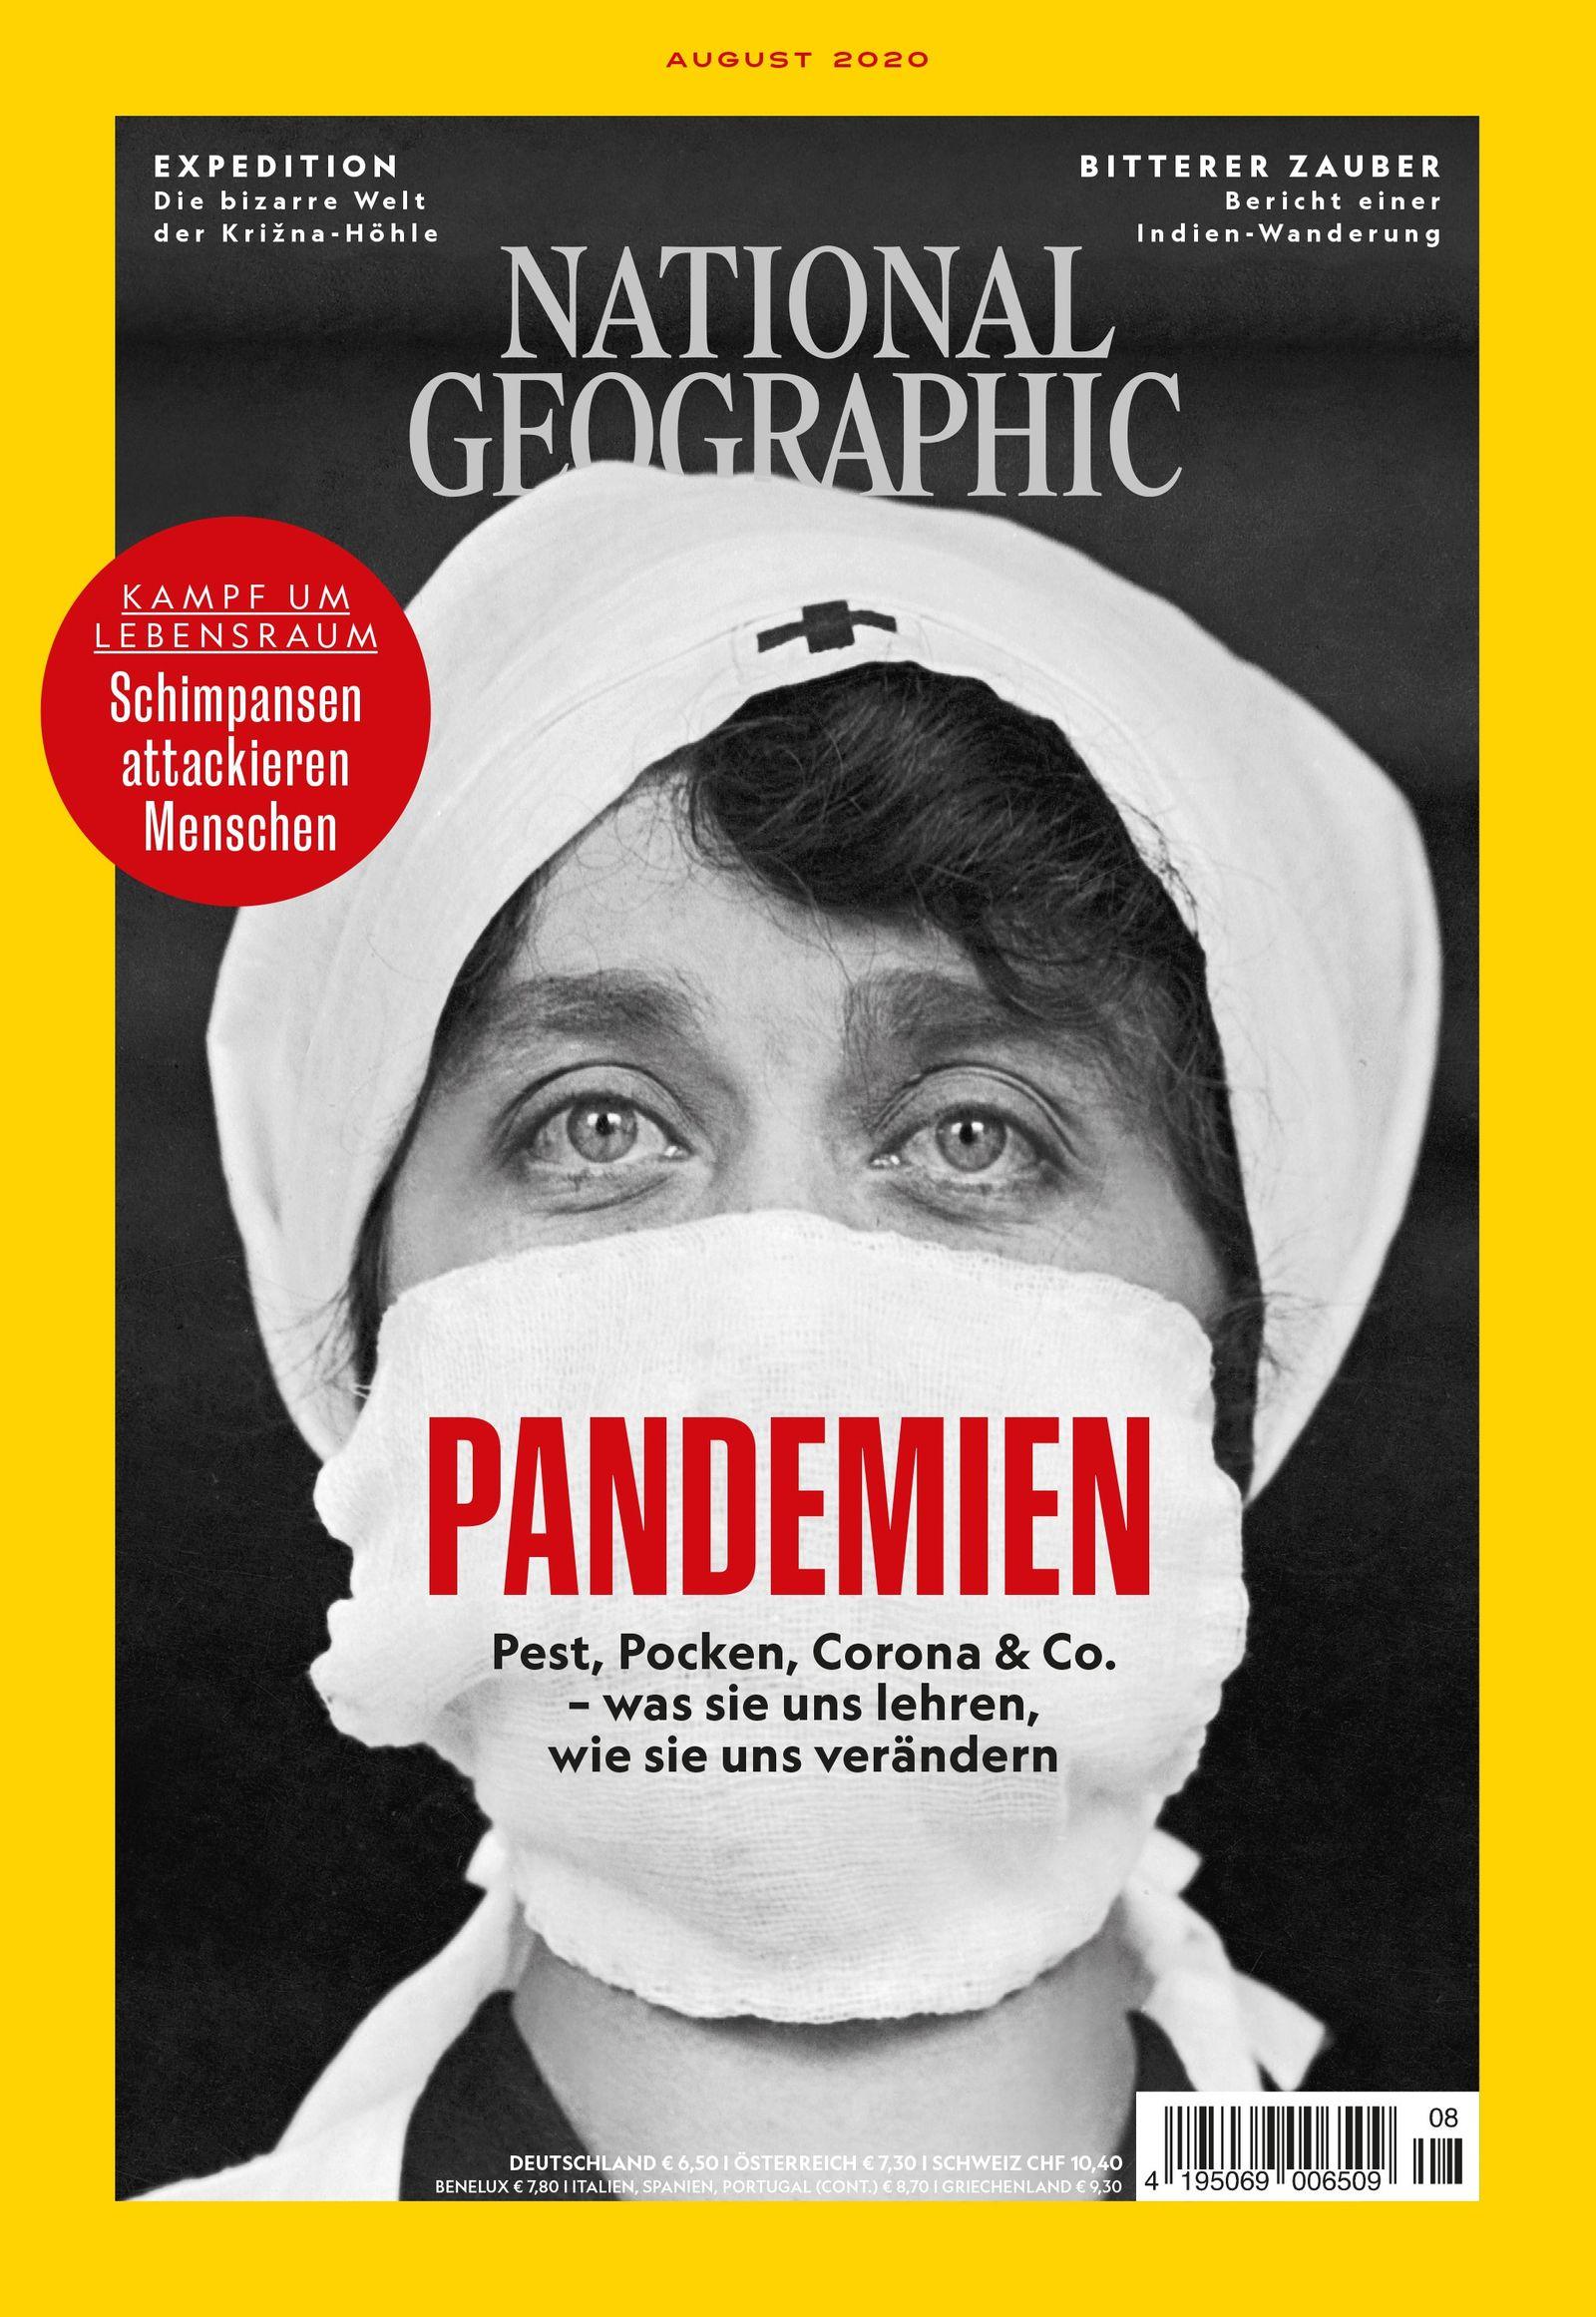 National Geographic-Magazin August 2020, Titelthema: Pandemien